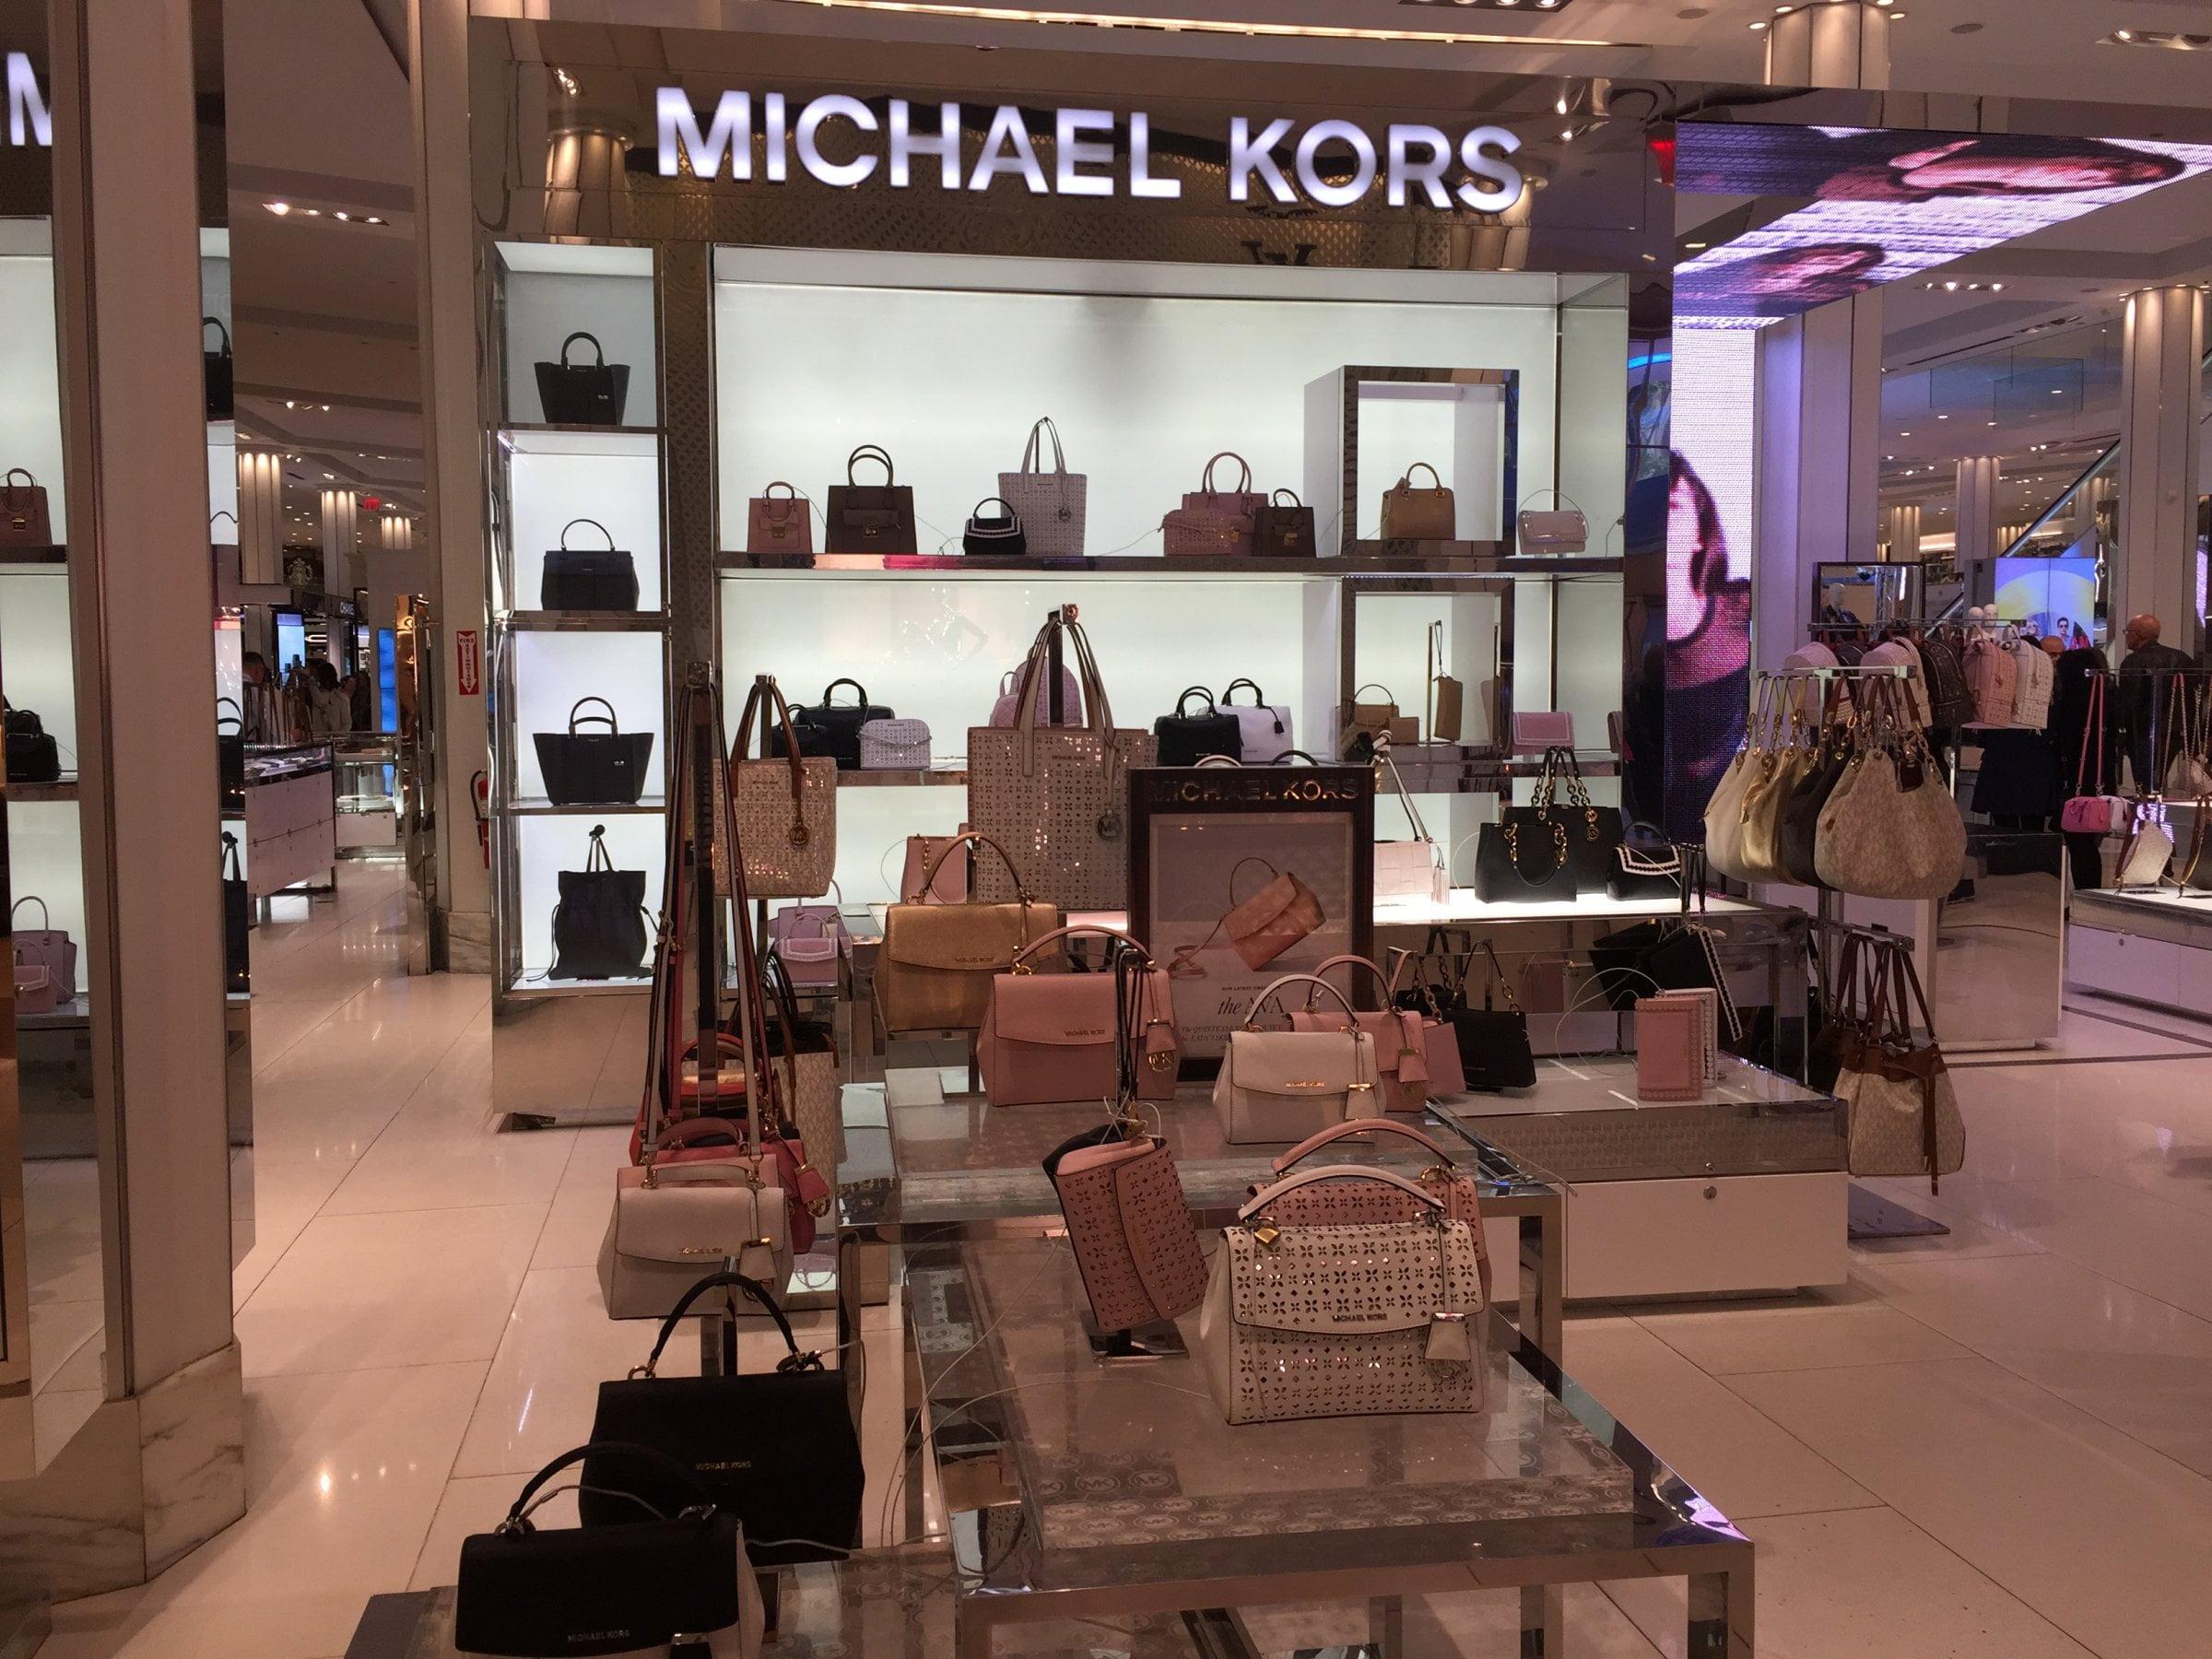 b4c44d20e04 Department Stores Are Damaging Handbag Sales - PurseBop